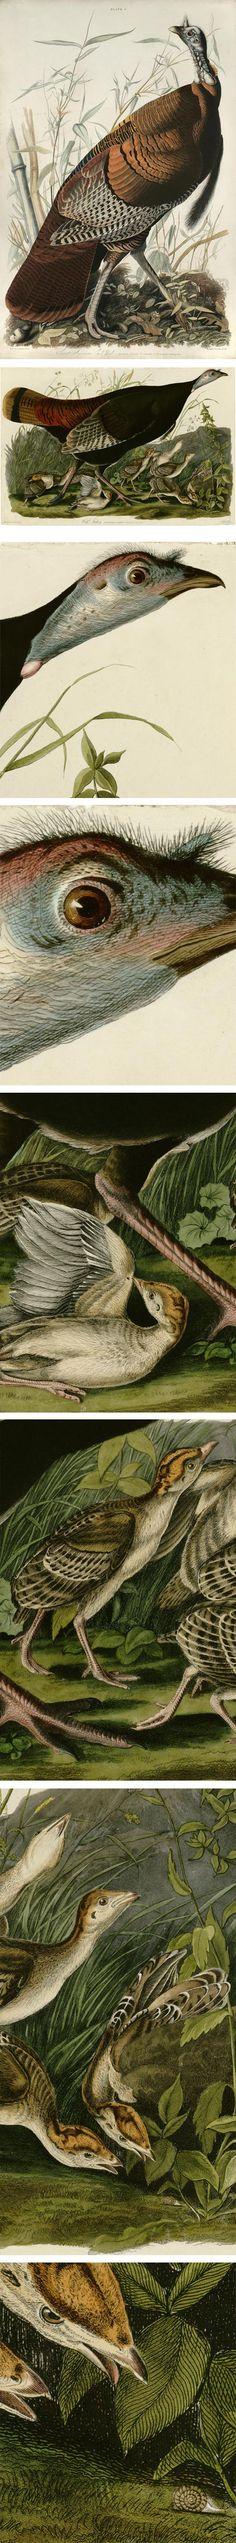 Meleagris gallapavo, John James Audubon, from Birds of America Audubon Prints, Audubon Birds, Kids Art Class, Birds Of America, Nature Artists, Wild Turkey, John James Audubon, Vintage Drawing, Bird Illustration